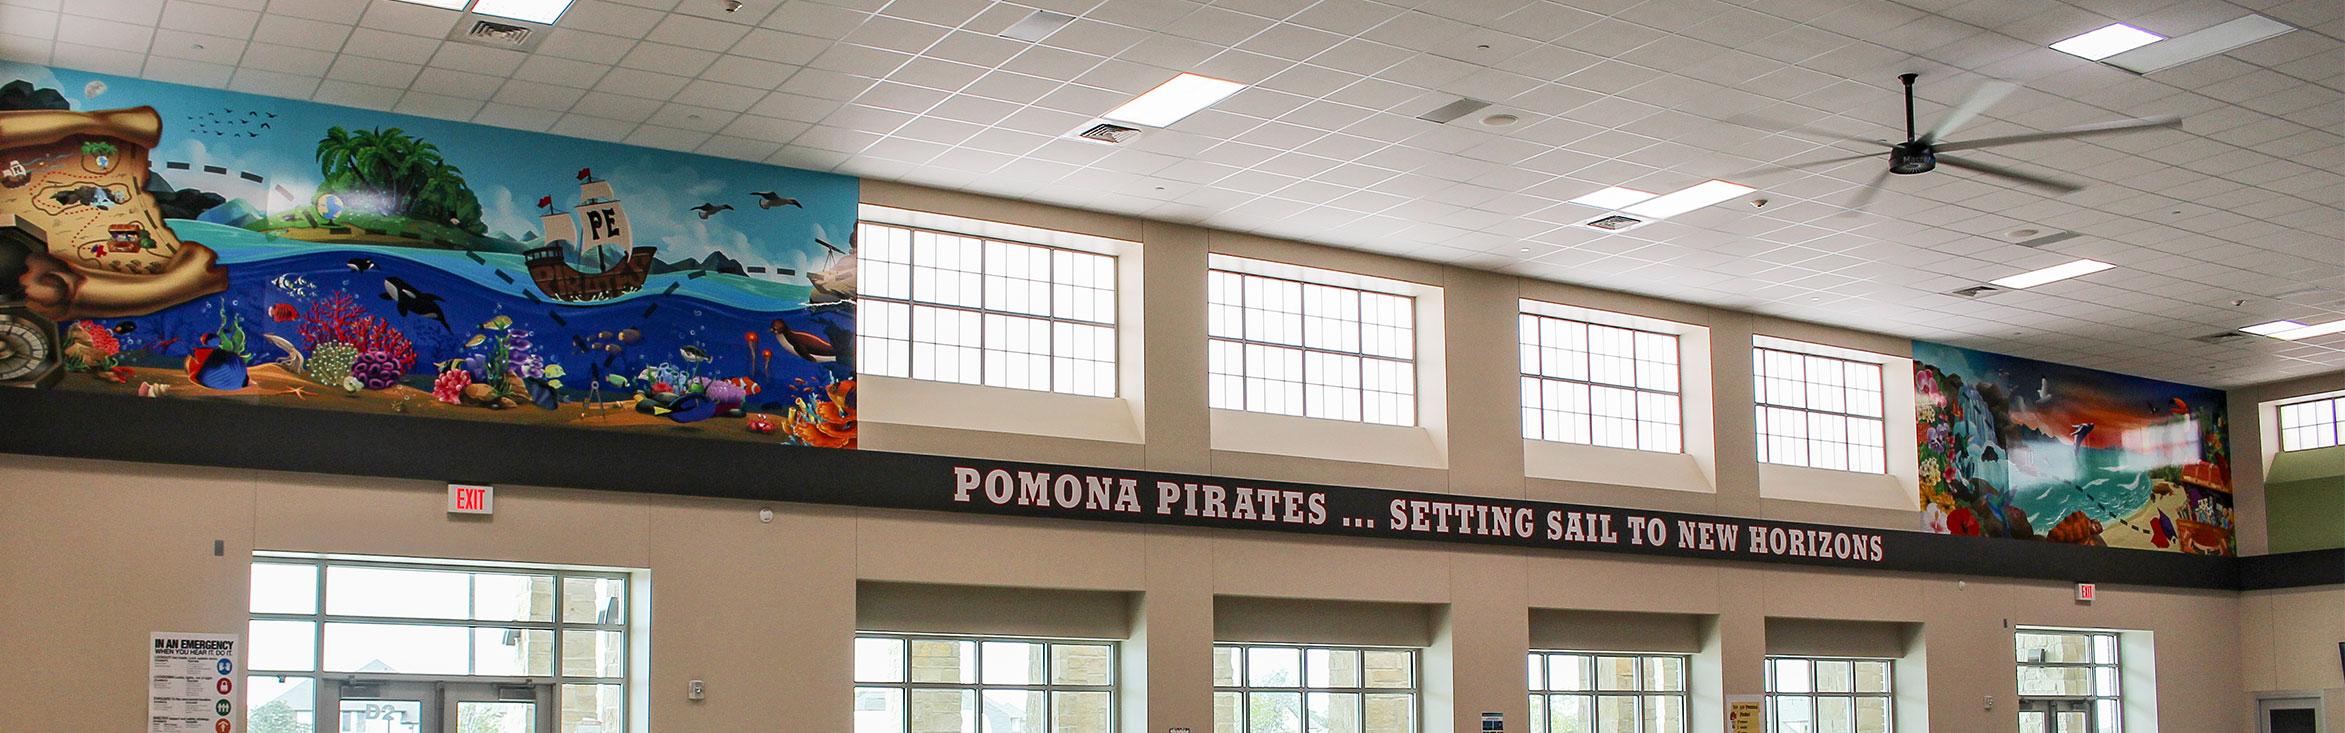 pomona elementry school murals